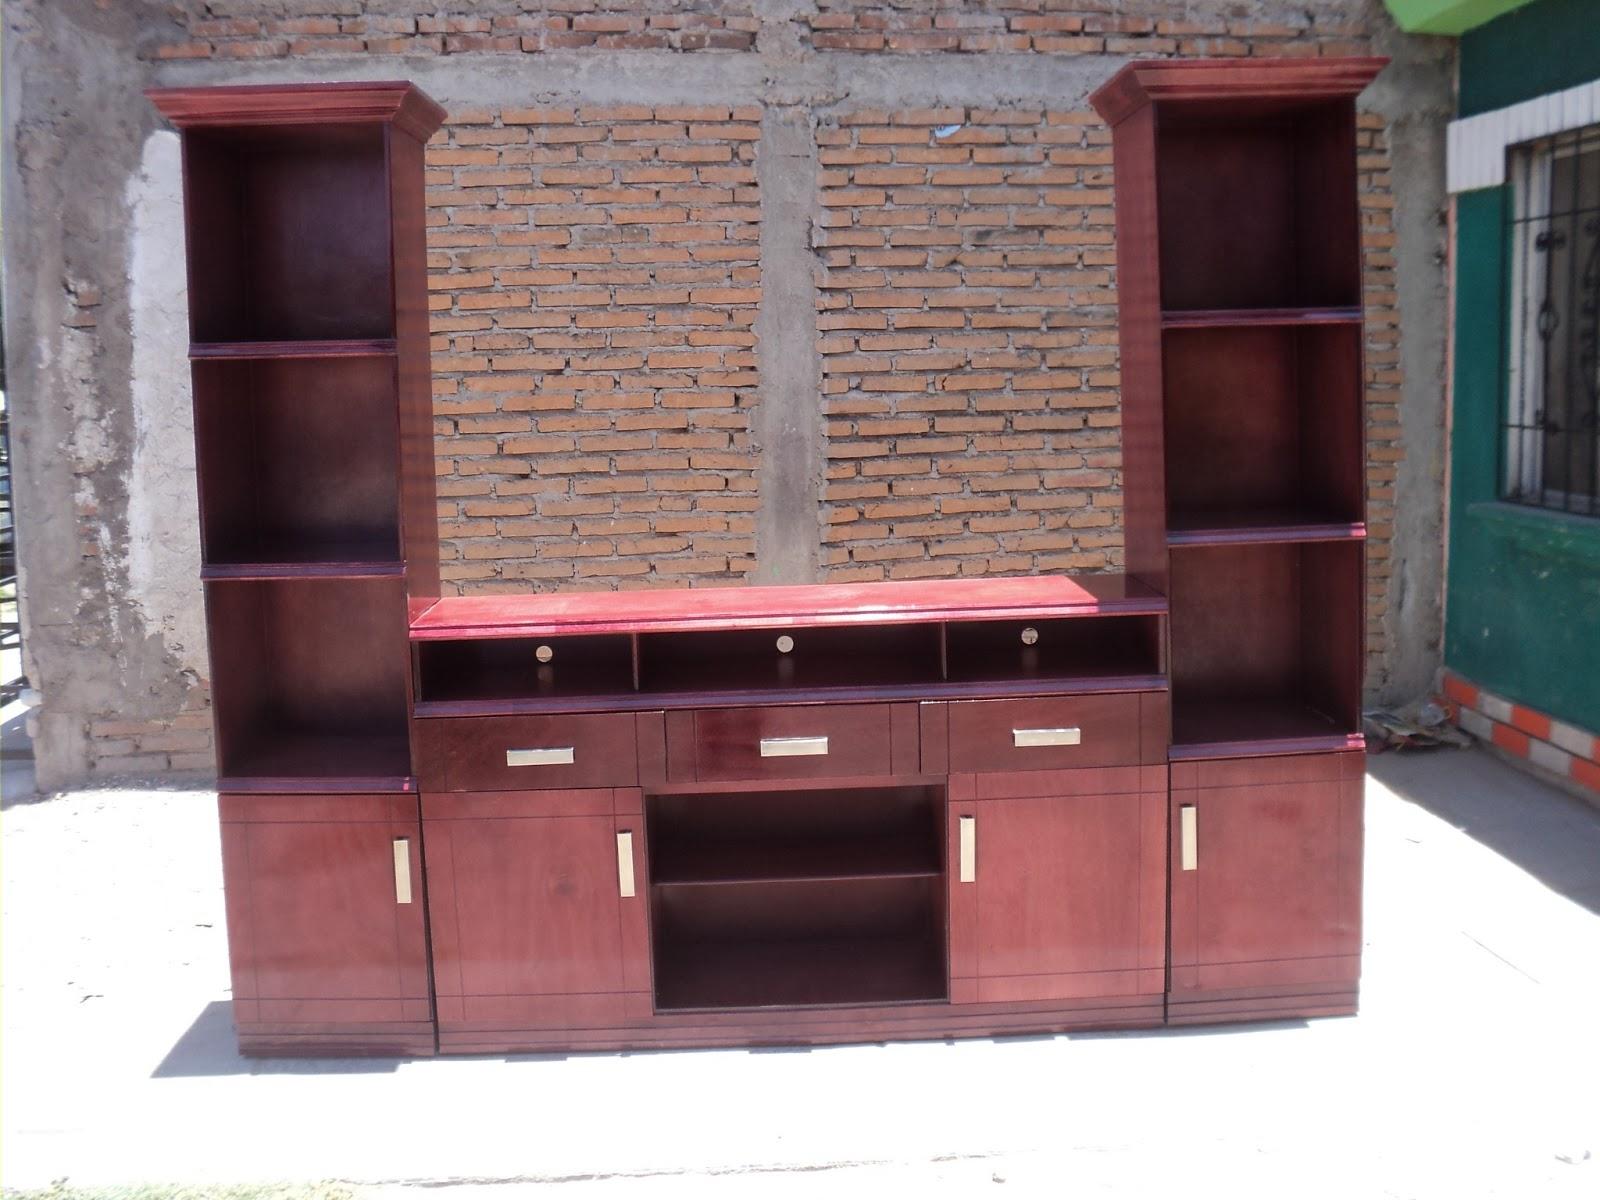 Carpinteria y muebles diaz centro de entretenimiento for Muebles diaz